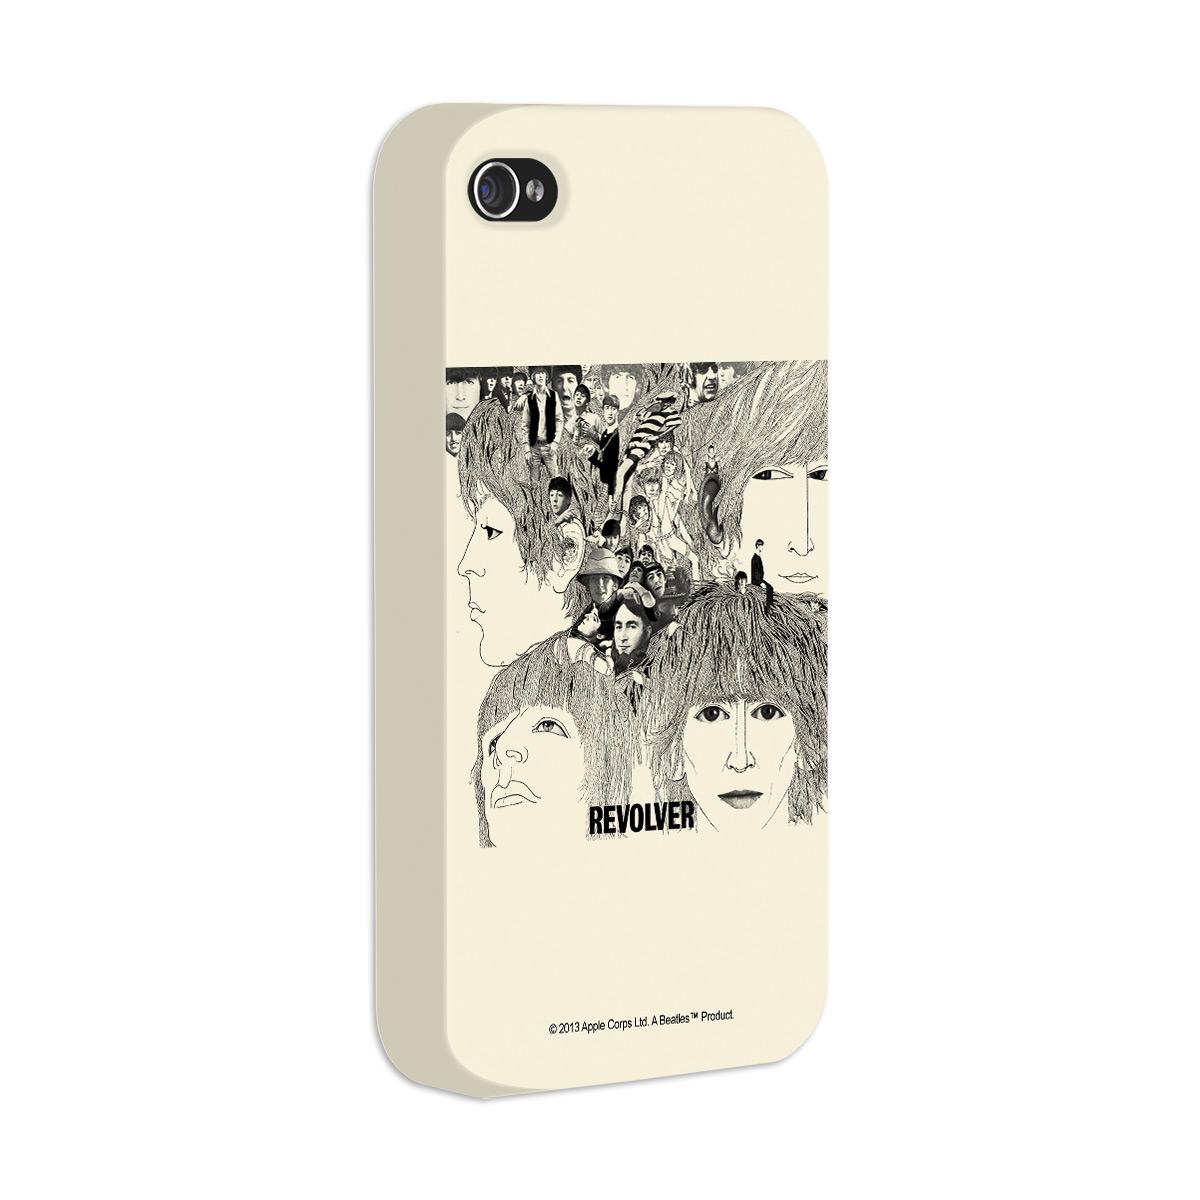 Capa de iPhone 4/4s The Beatles Revolver